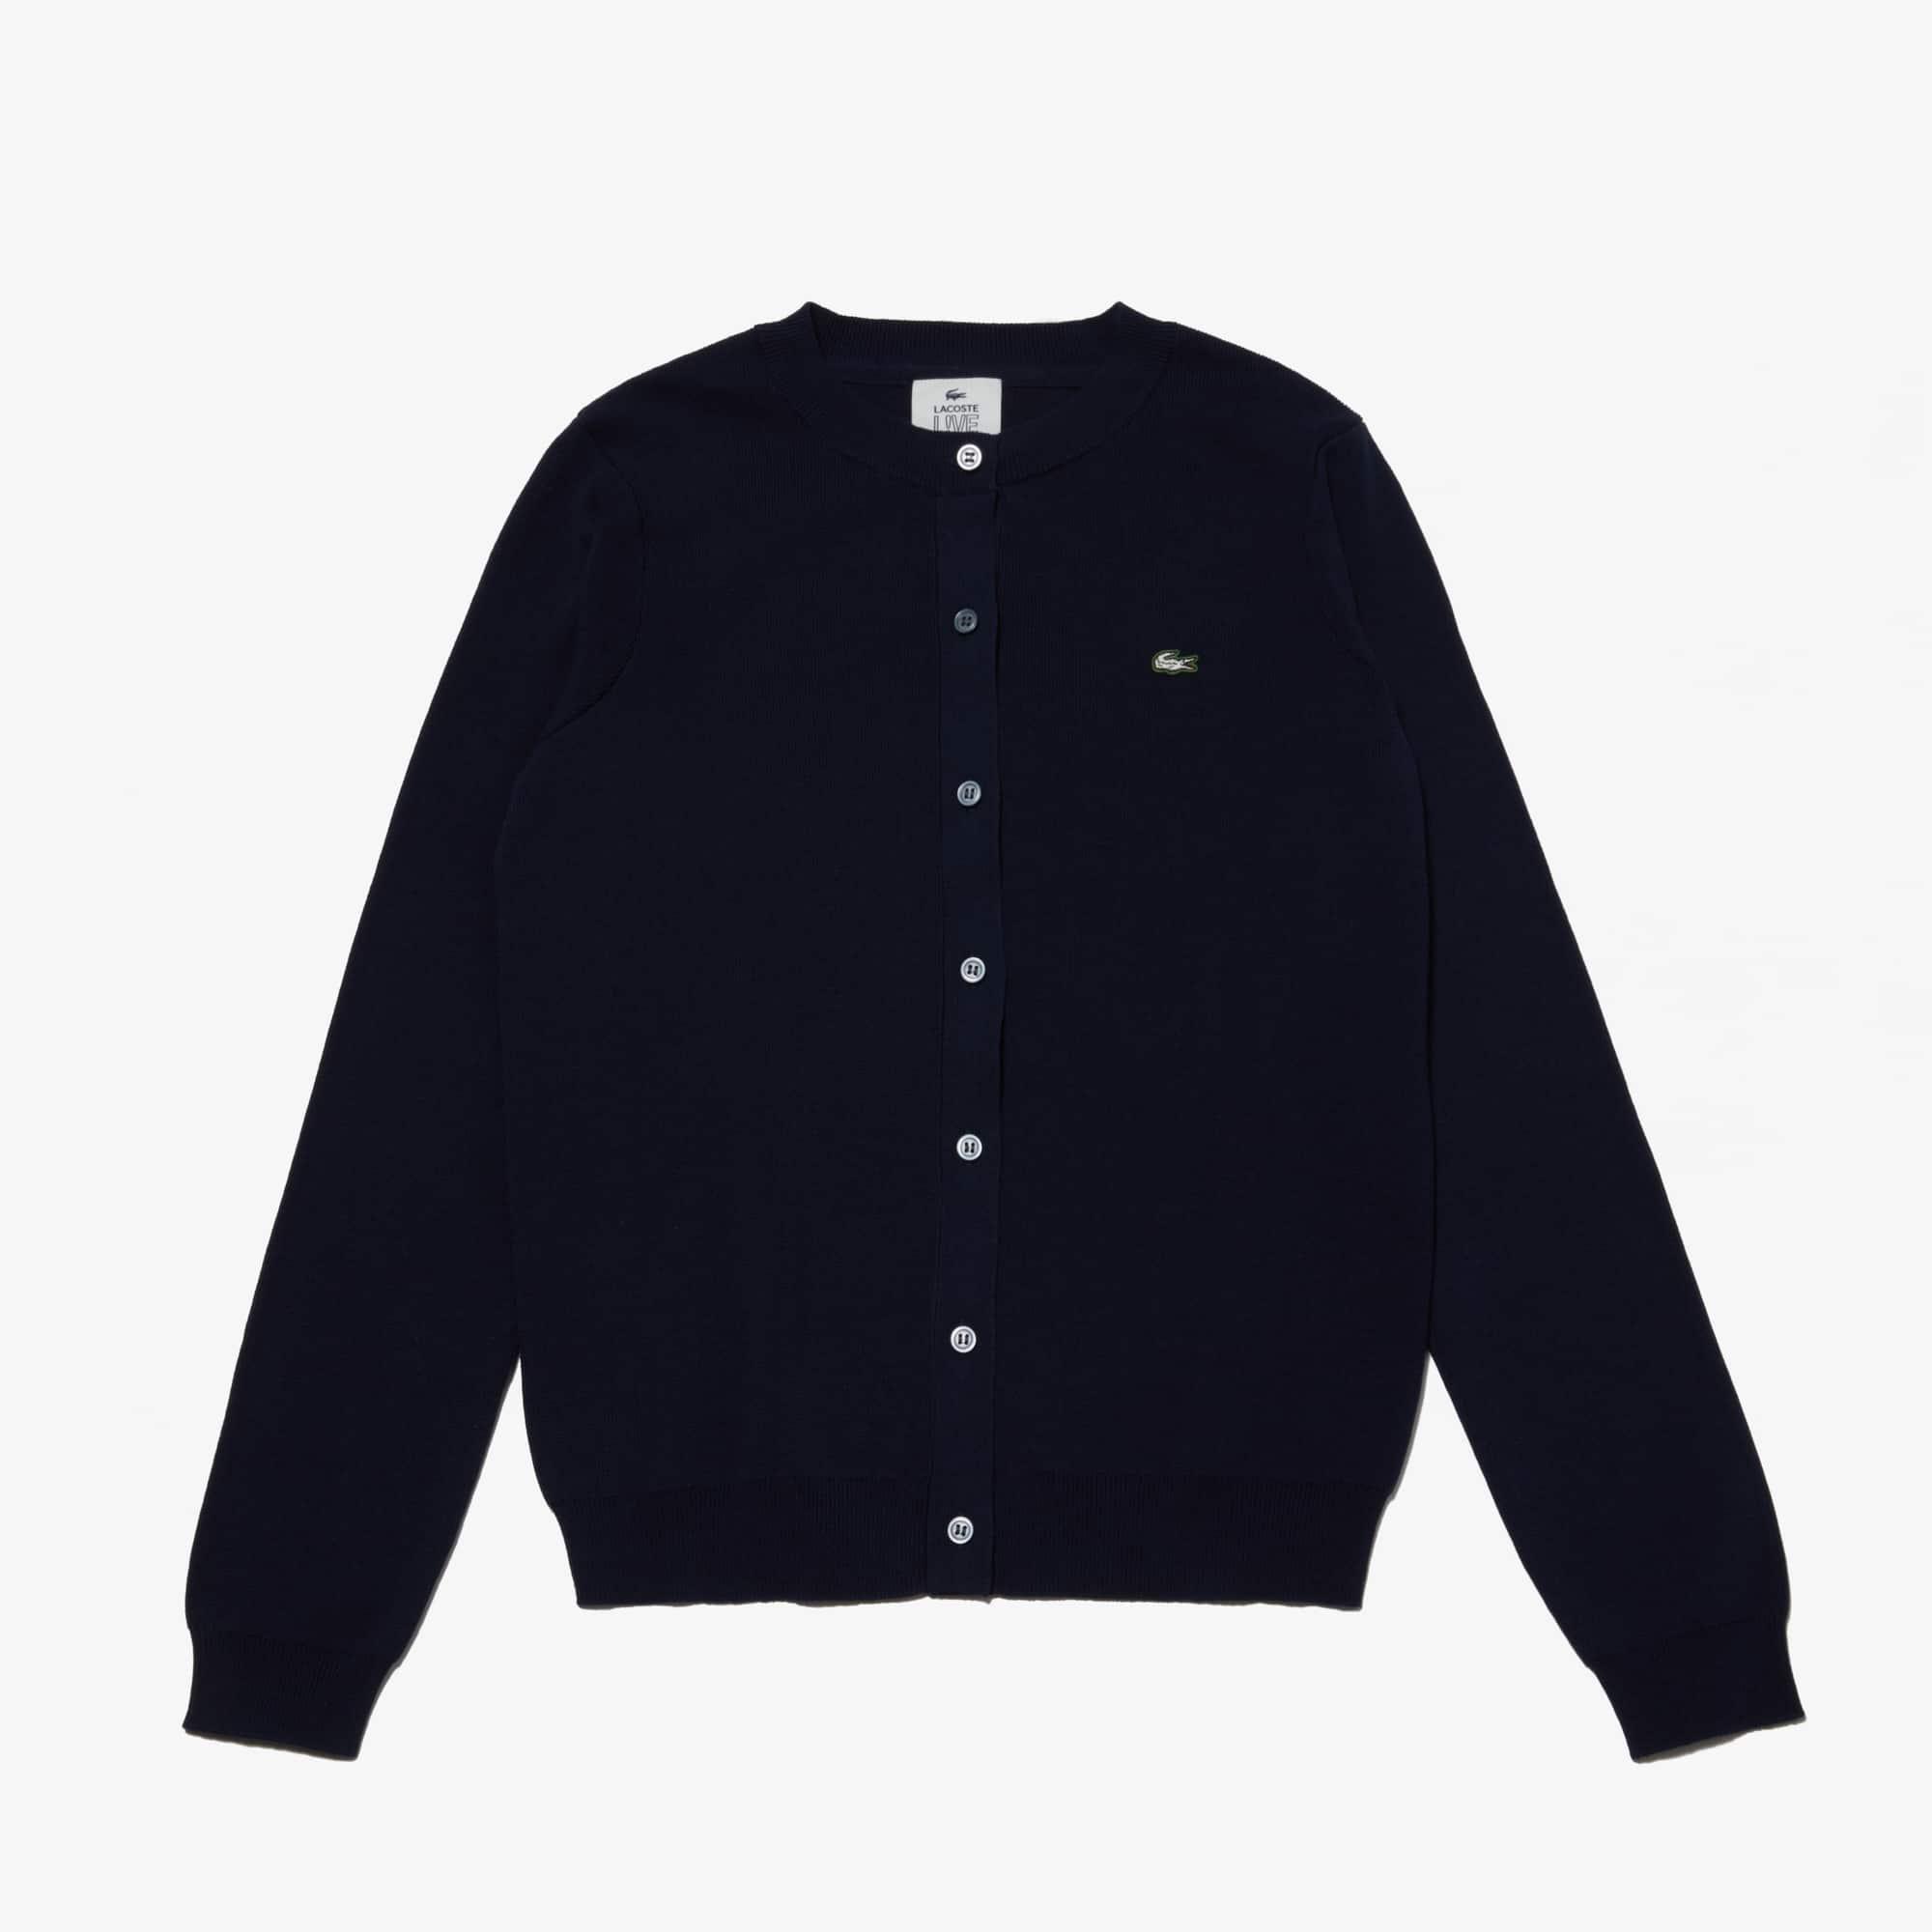 153d572f55e4f Sweaters and Sweatshirts